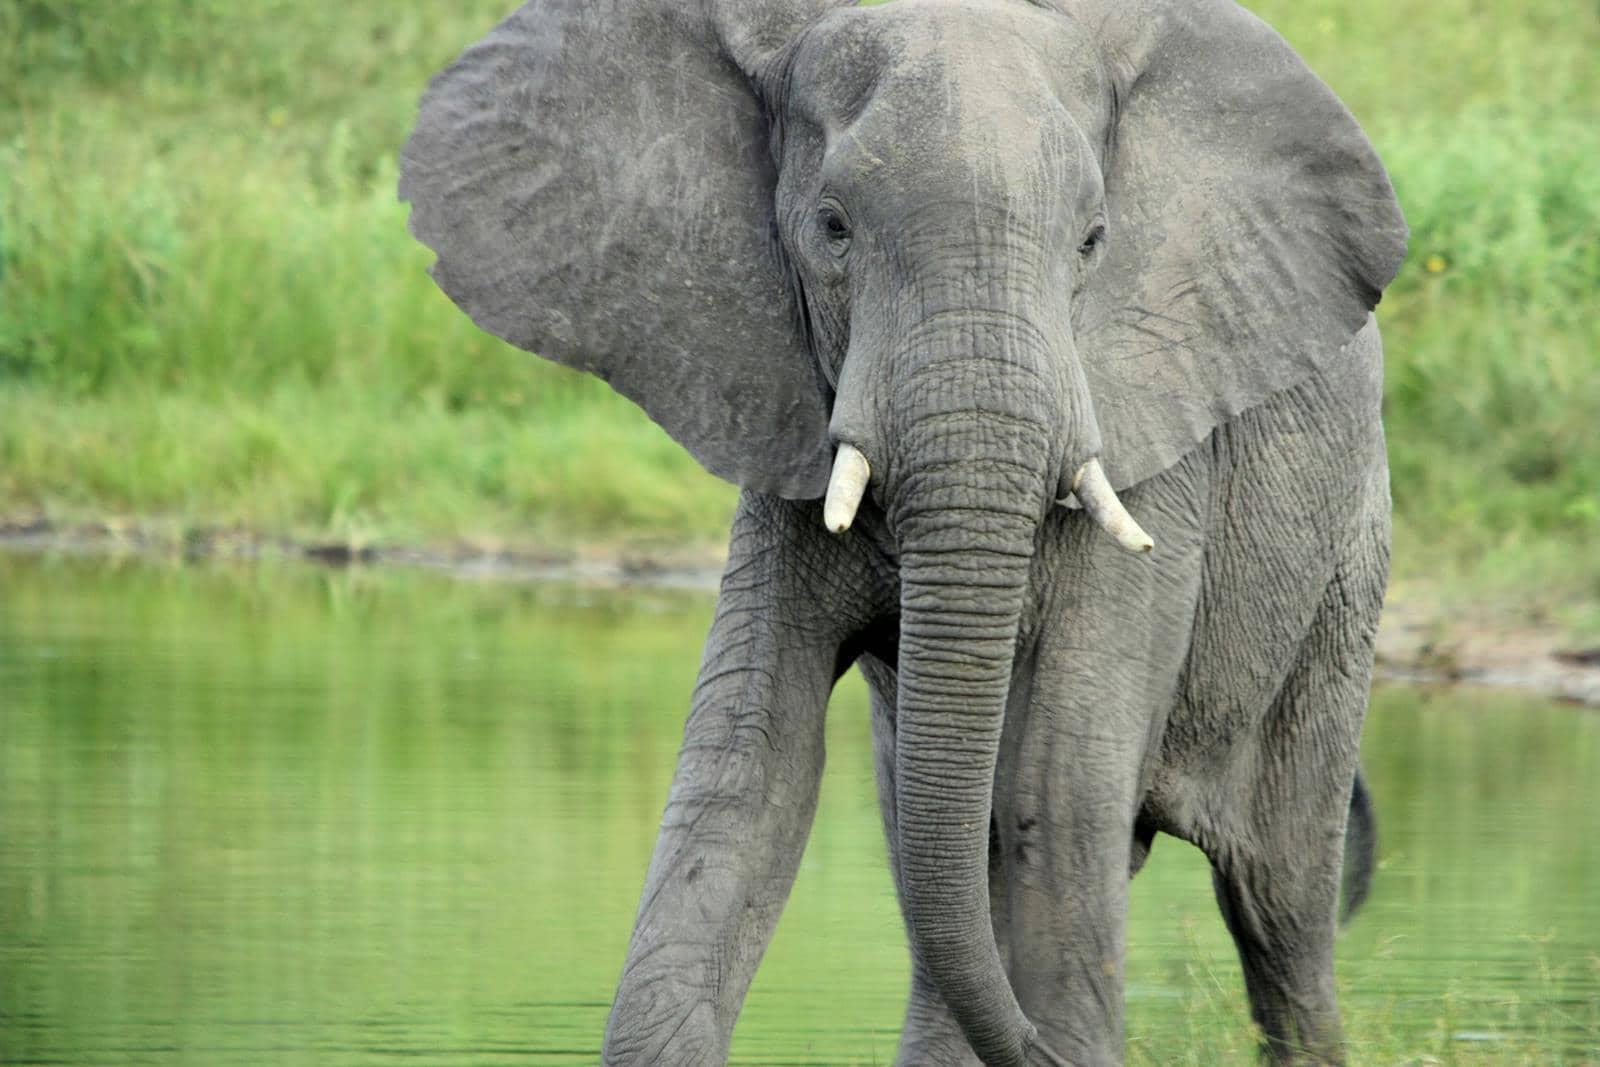 Elephant in the Bwabwata National Park, Namibia.